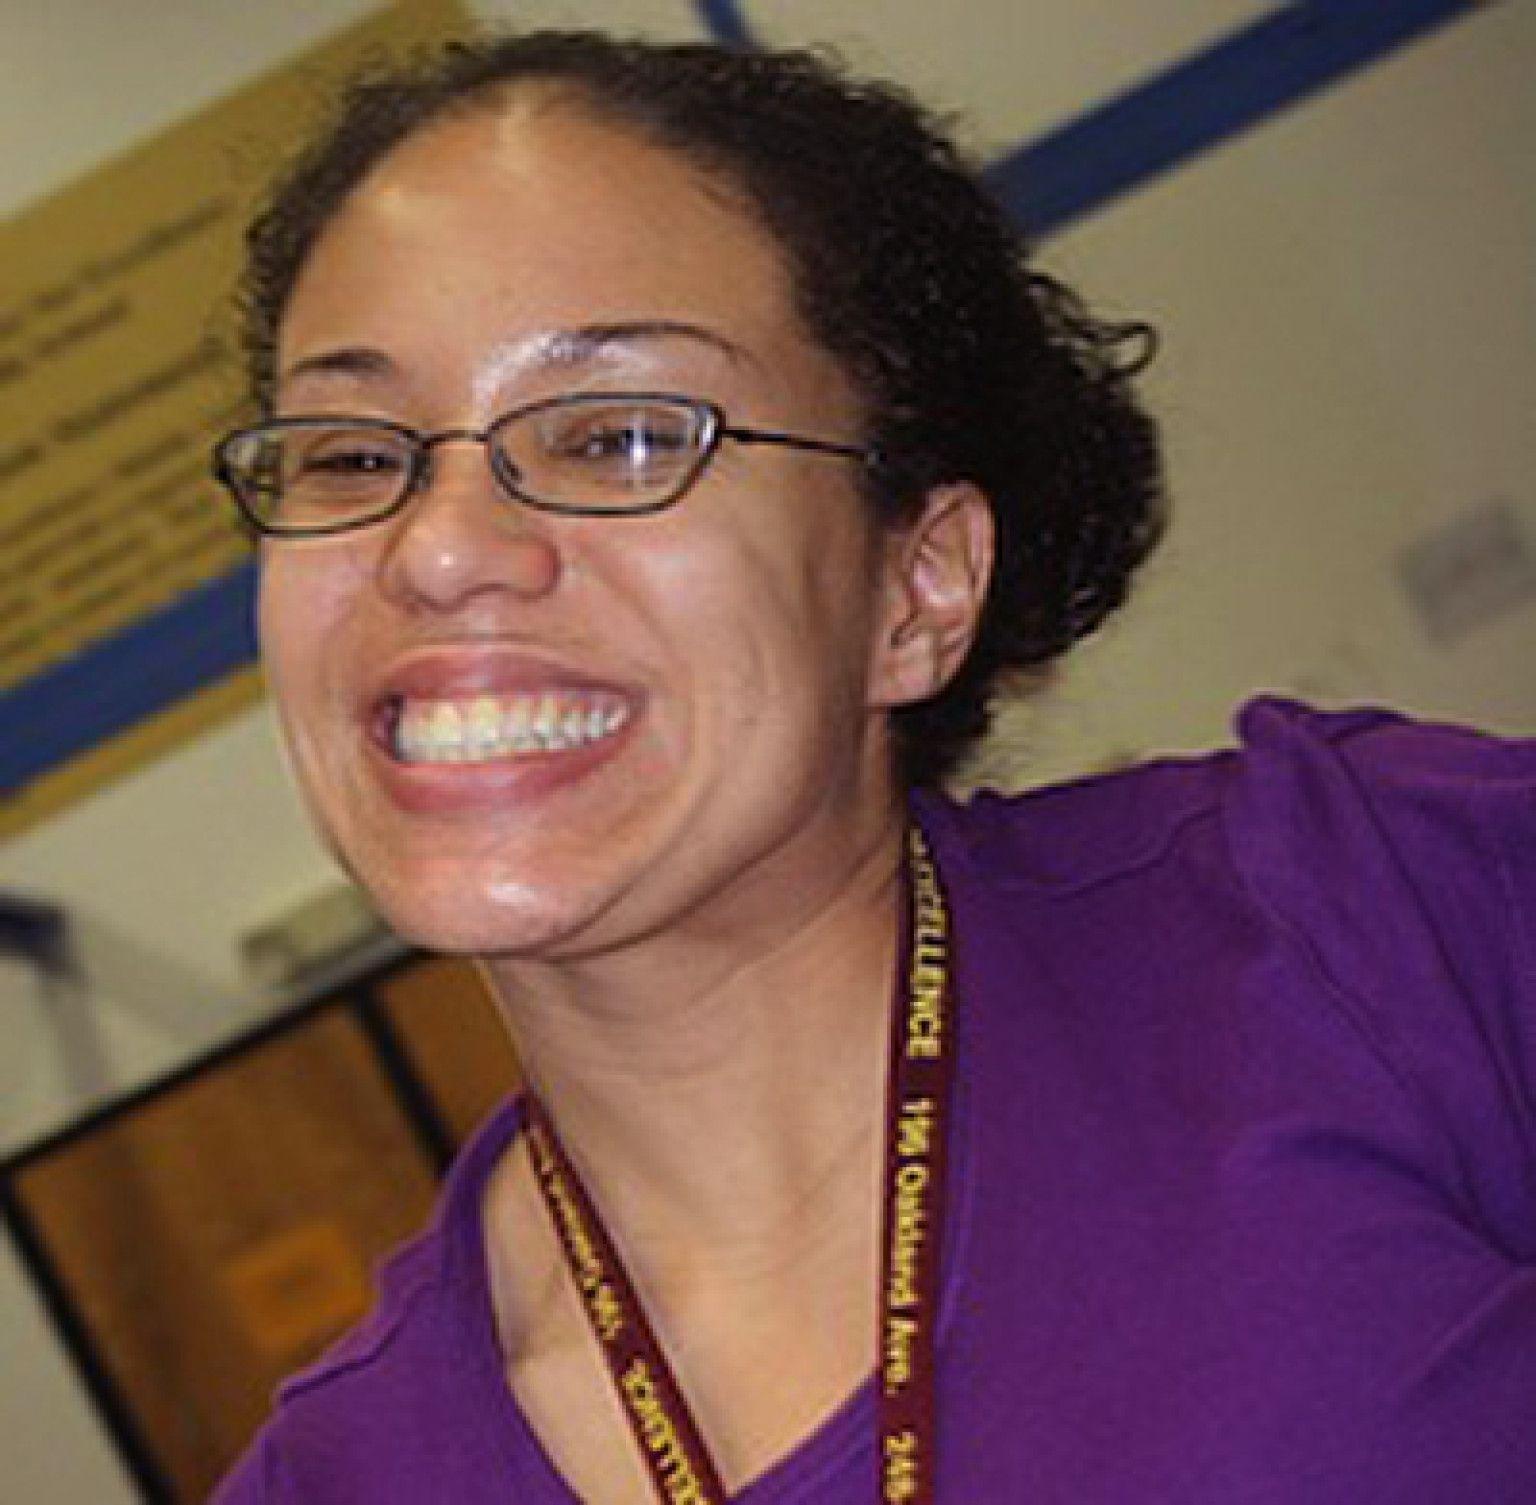 Brooke Harris, Teacher Fired Over Trayvon Martin Fundraiser, Facing Termination At New EAA School